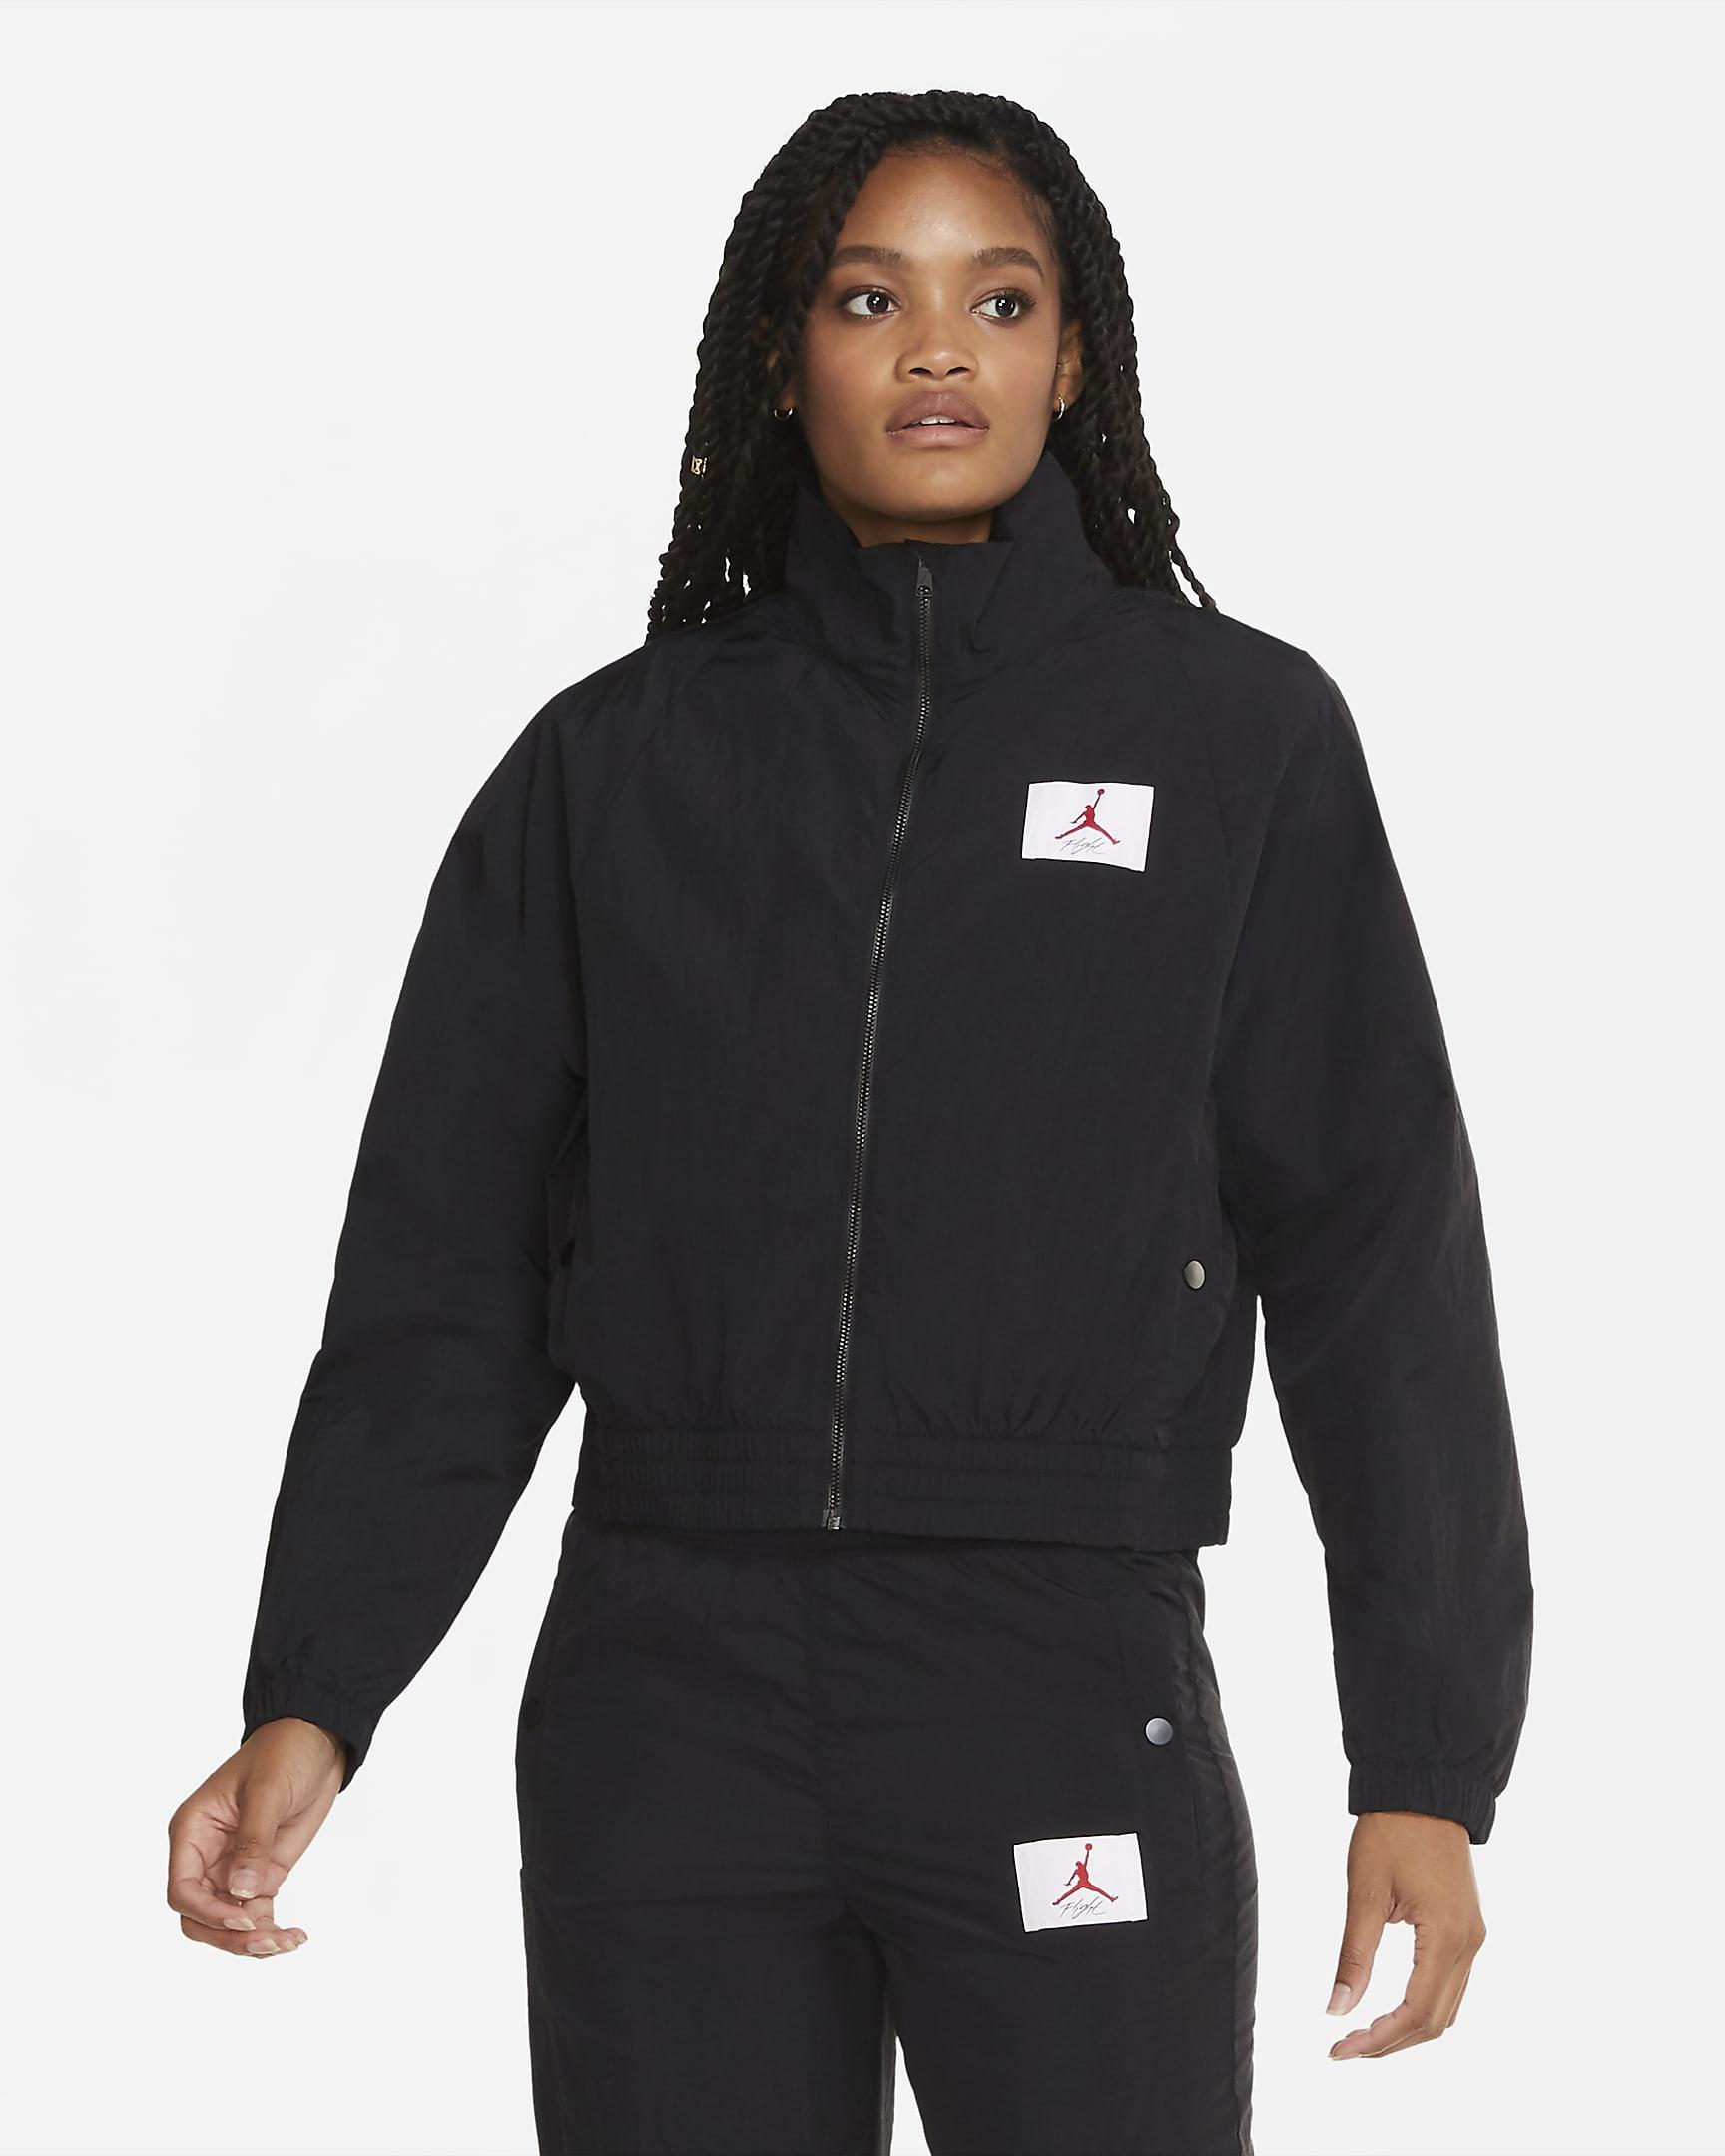 jordan-womens-woven-jacket-dwlC2T.png